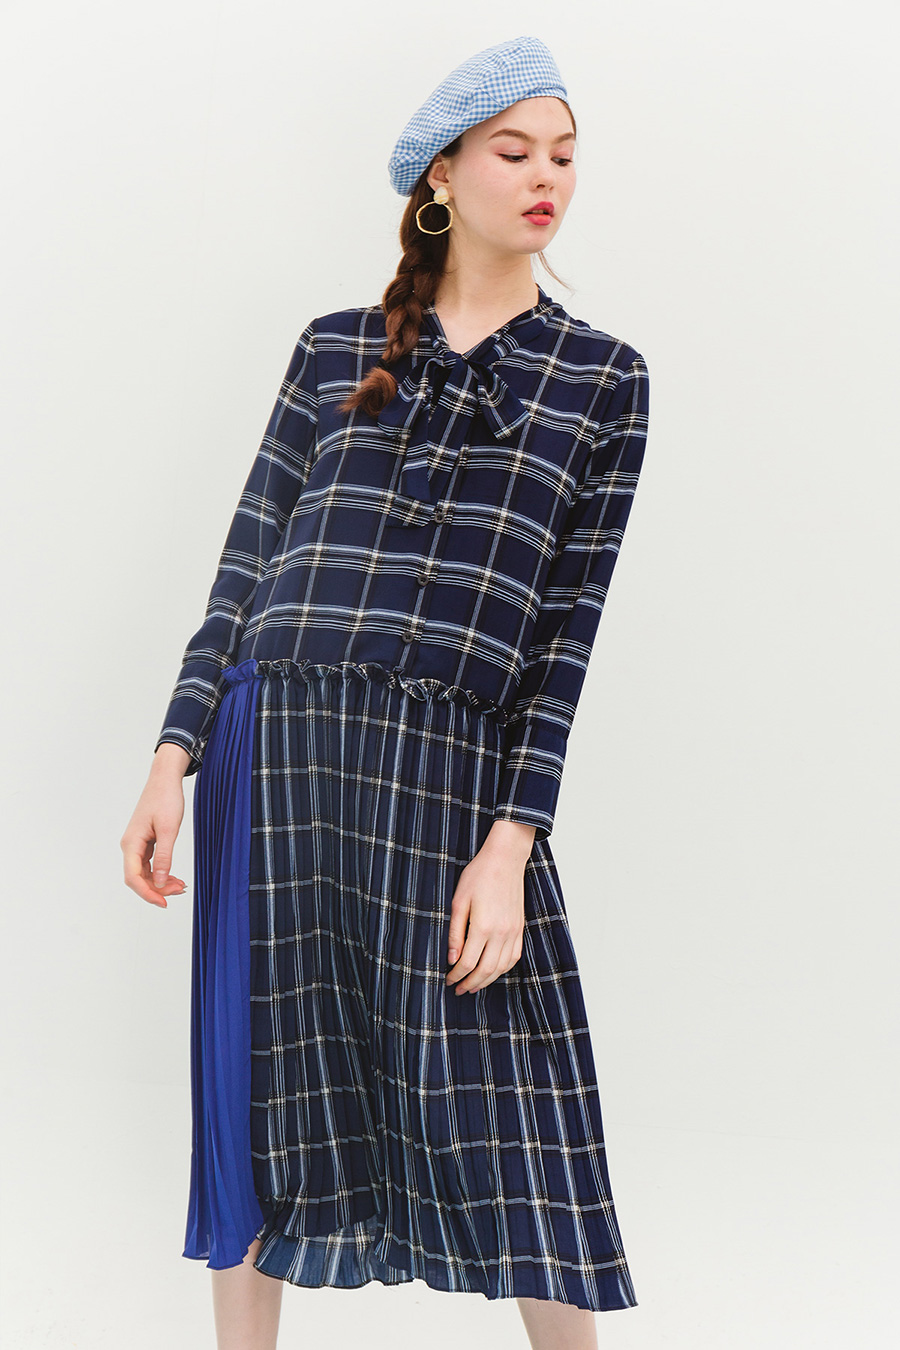 CARELL DRESS - OXFORD BLUE